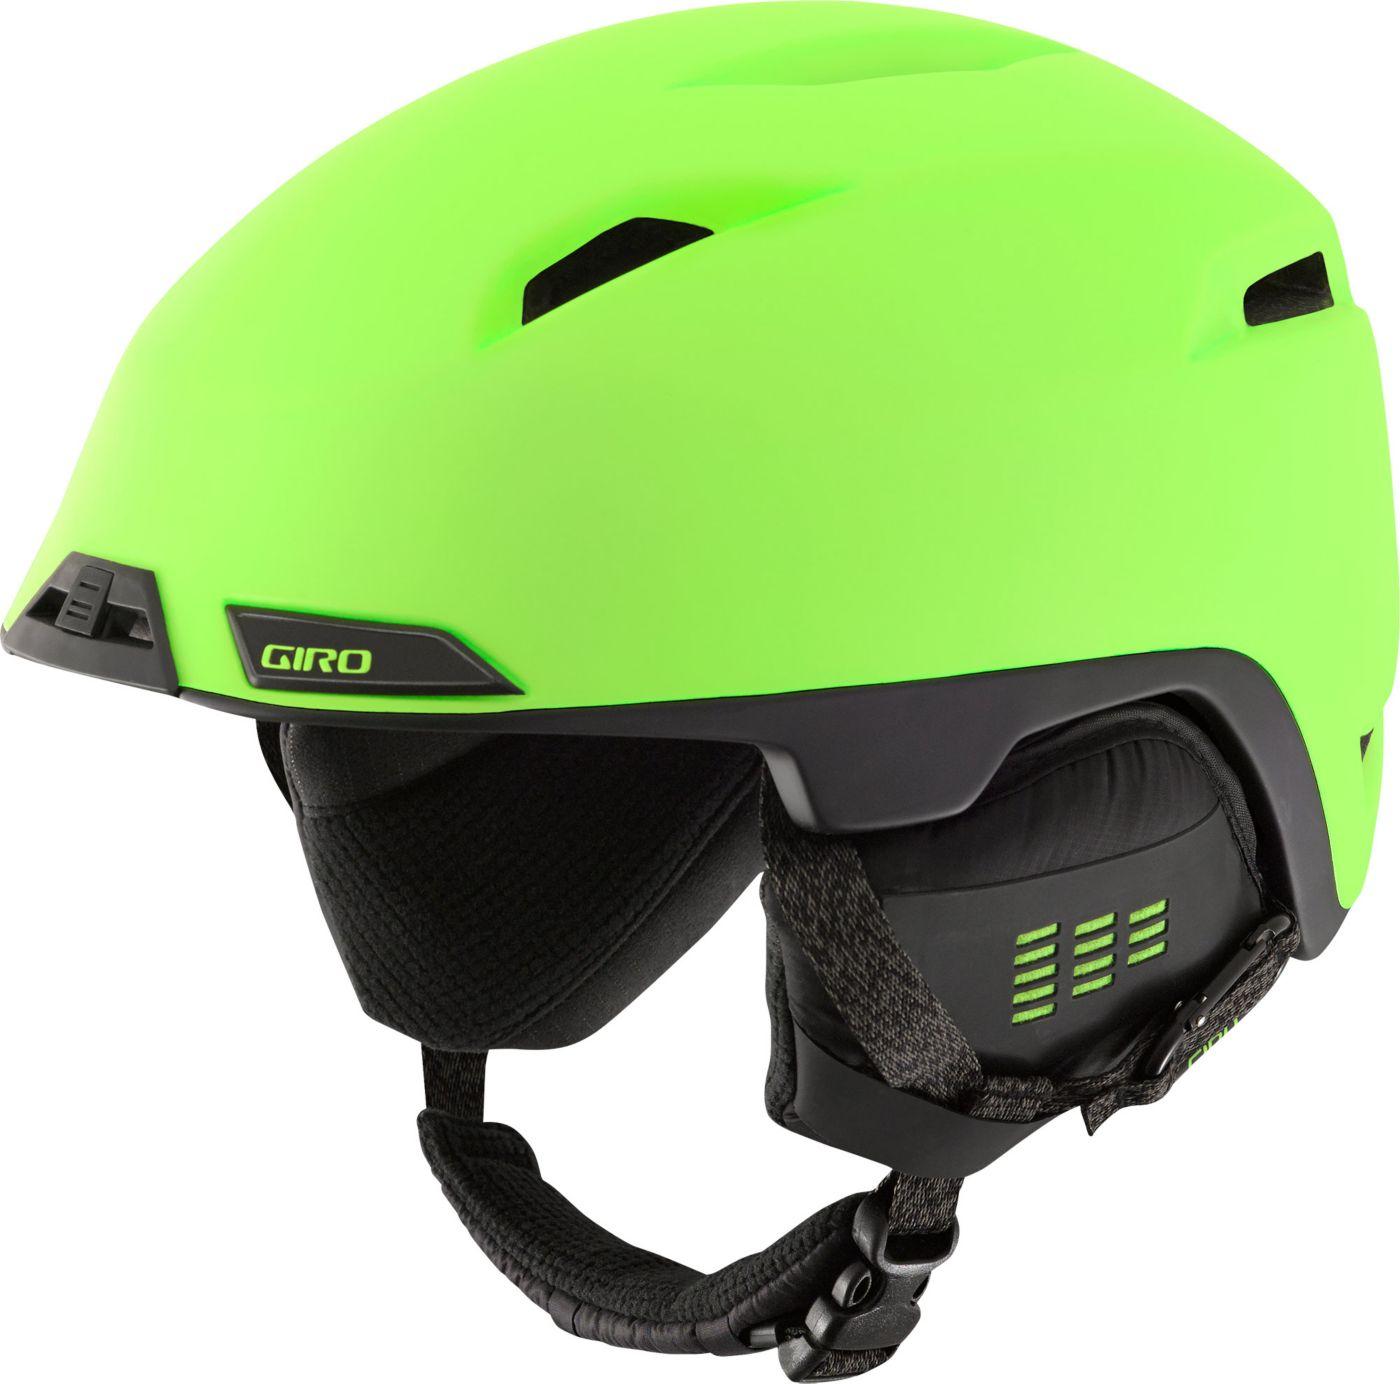 Giro Adult Edit Snow Helmet